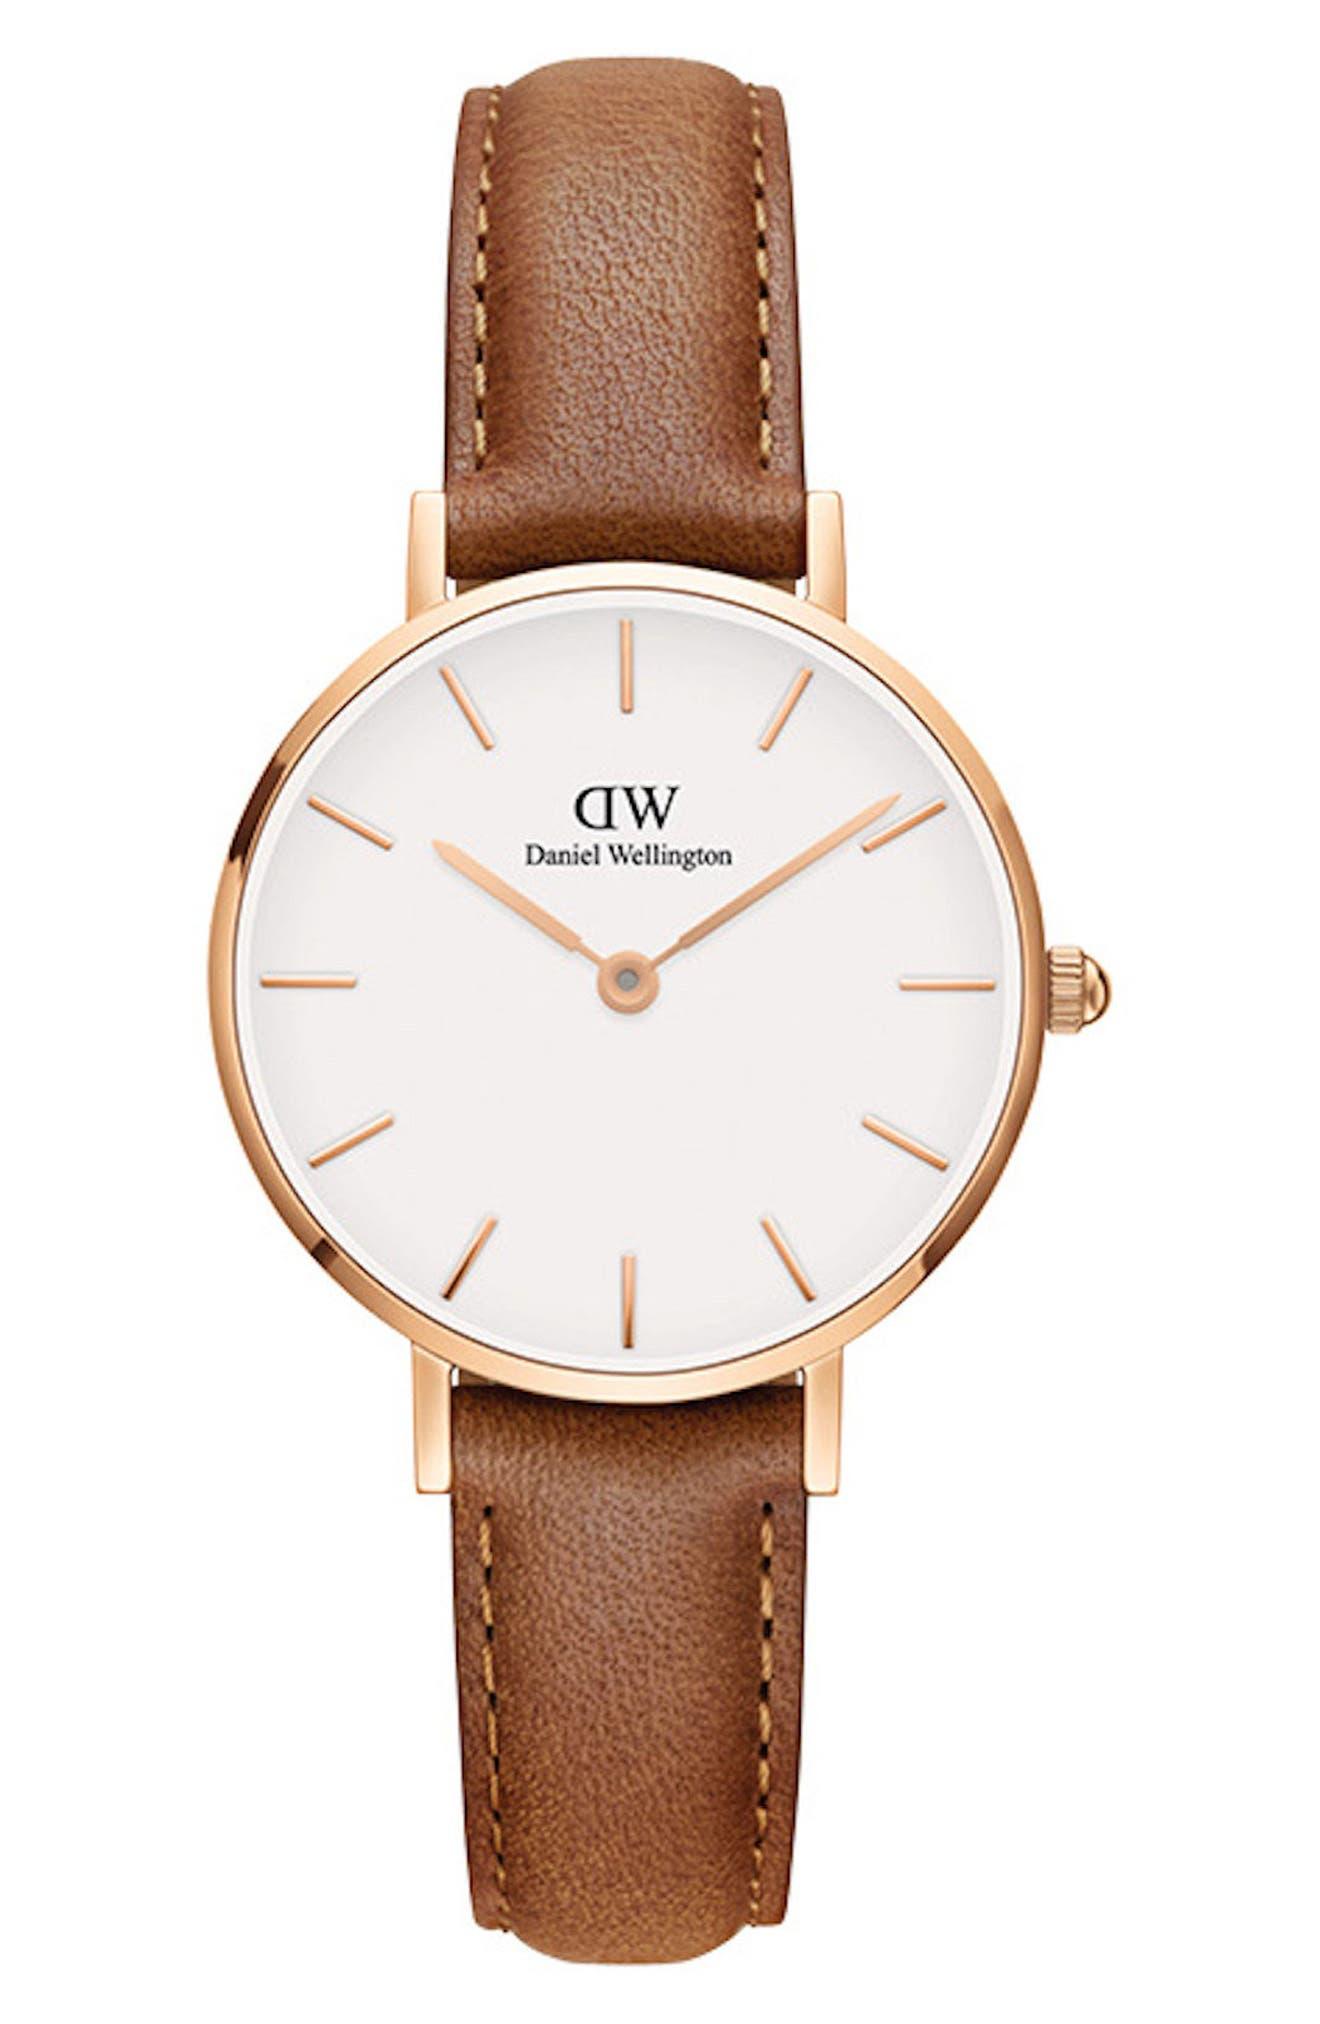 DANIEL WELLINGTON, Classic Petite Leather Strap Watch, 28mm, Main thumbnail 1, color, LIGHT BROWN/ WHITE/ ROSE GOLD